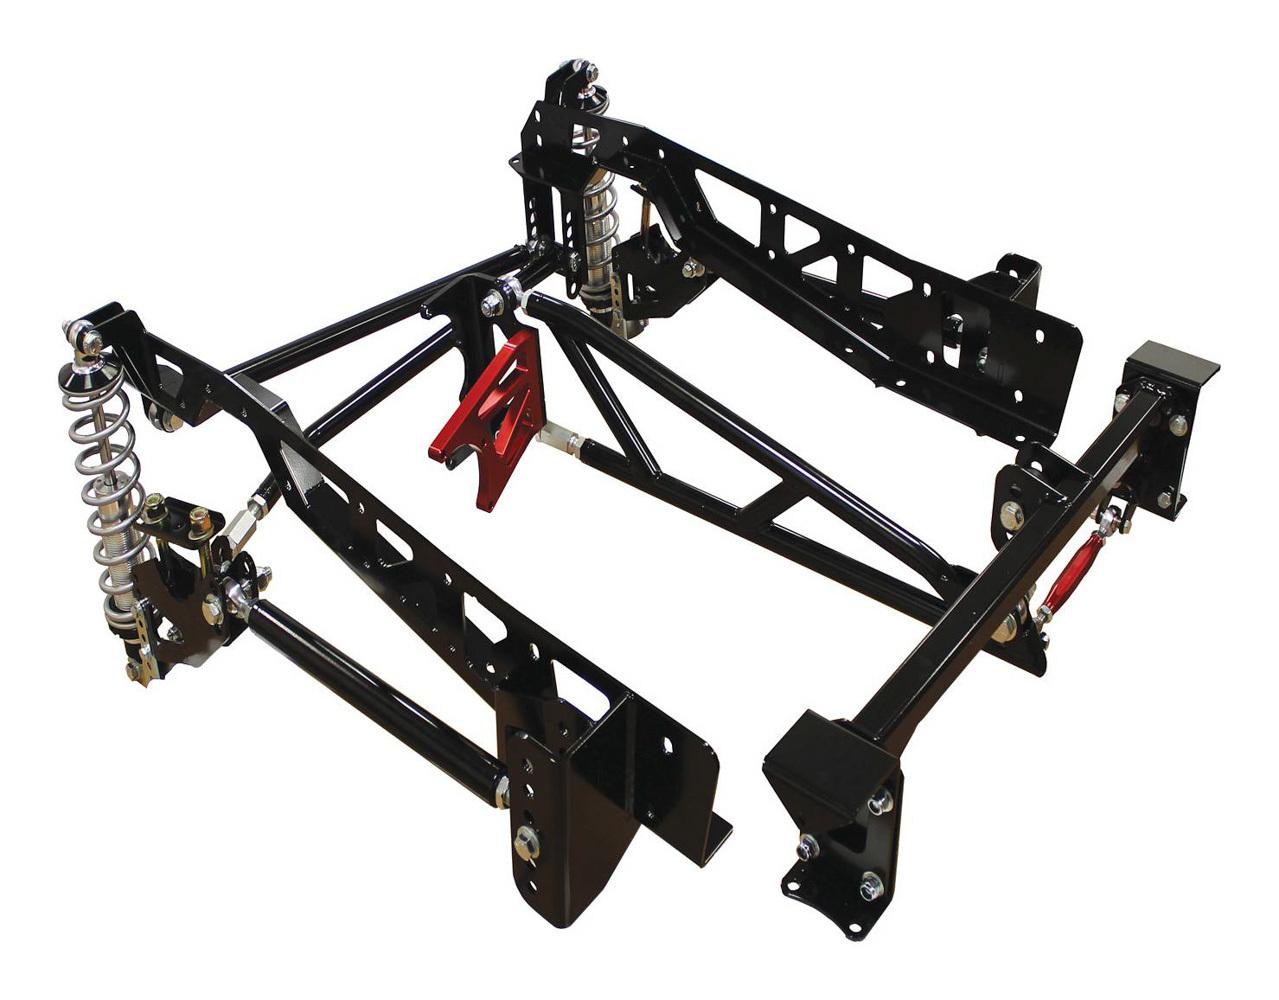 Qa1 Rear Suspension F100 Single Adjustable 65-72